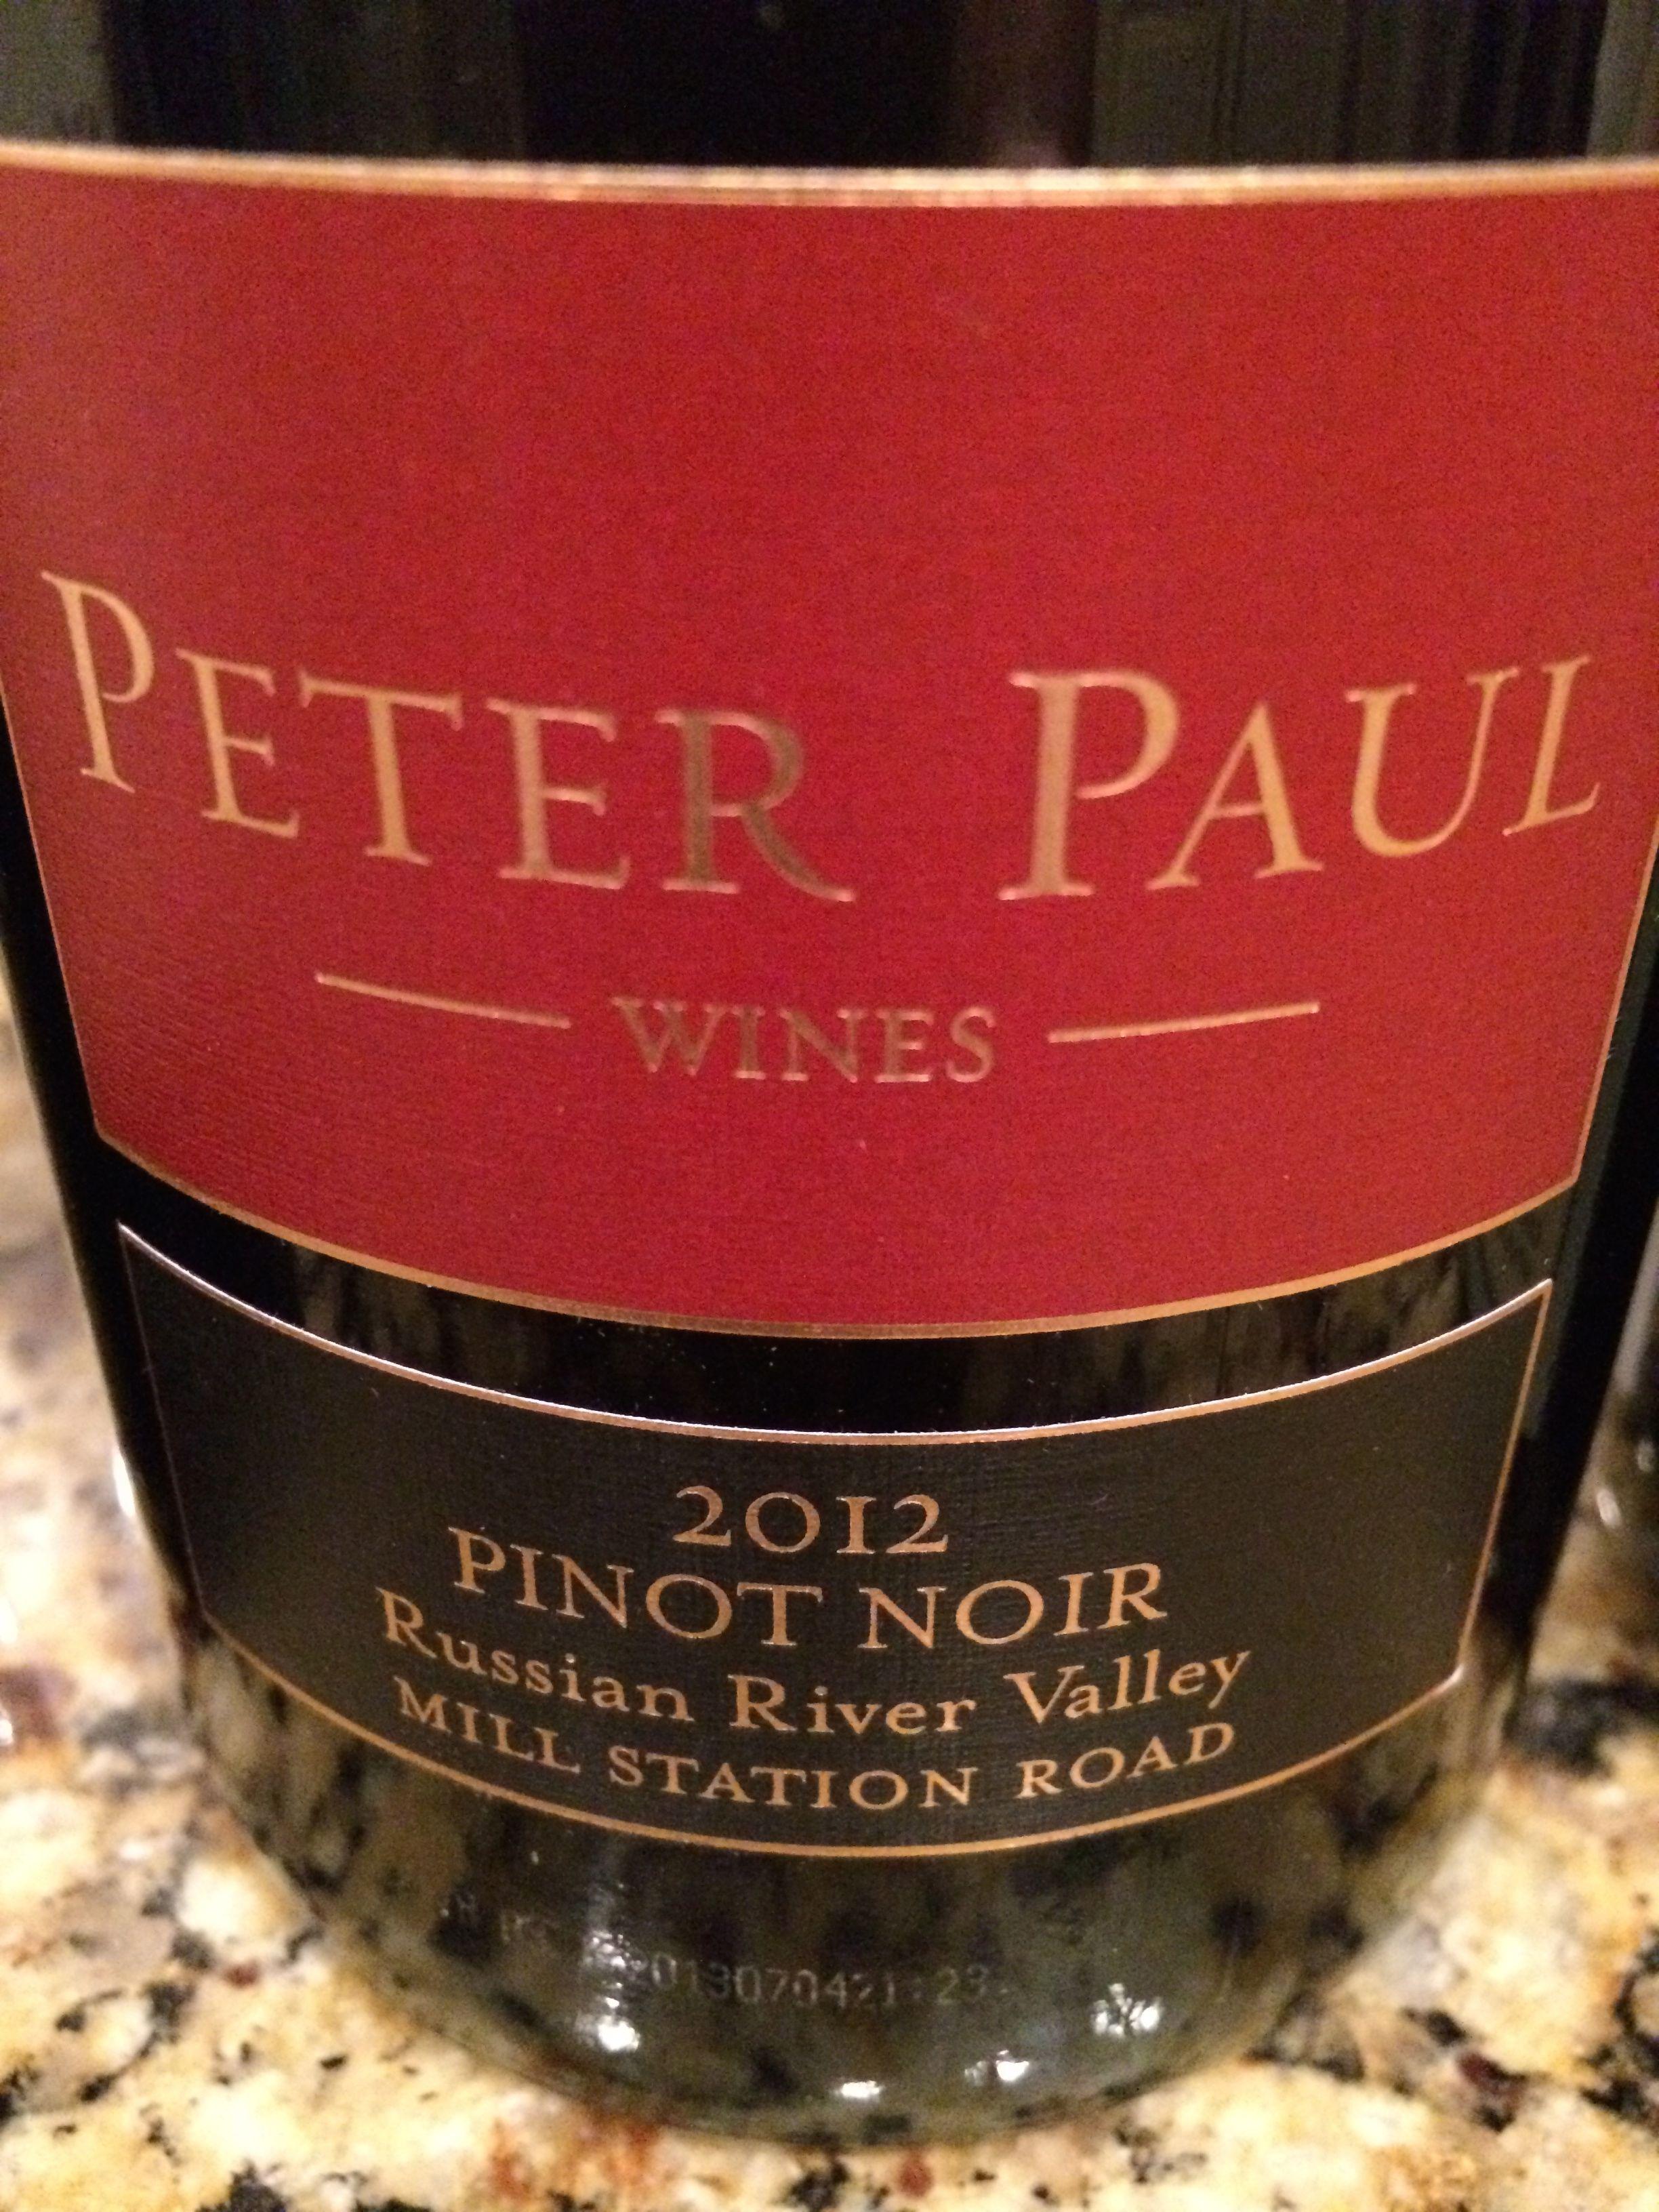 Peter Paul Russian River Valley Pinot Noir 2012 Wine Pinotnoir California Pinot Noir Wines Wine Bottle